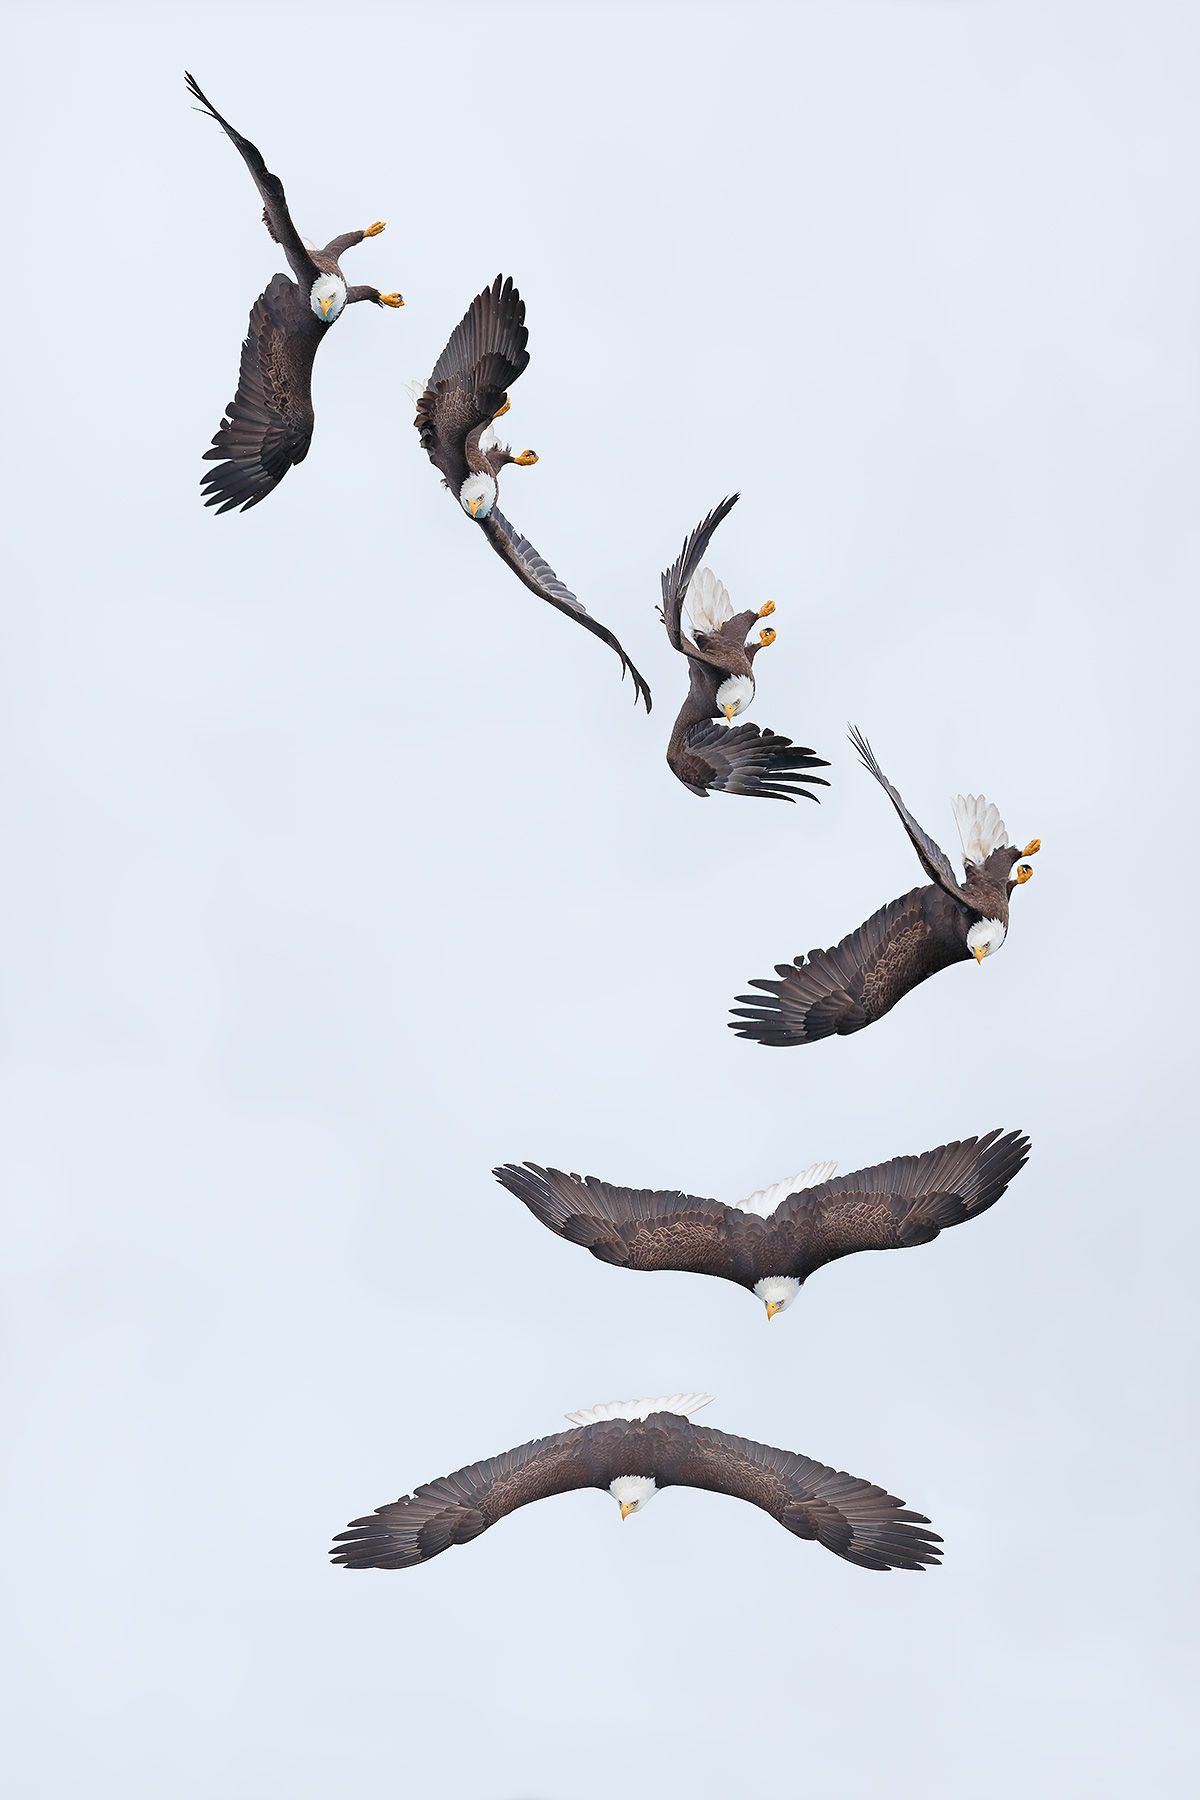 bald-eagle-air-turn-flight-sequence_b8r5726-kachemak-bay-homer-alaska-usa.jpg